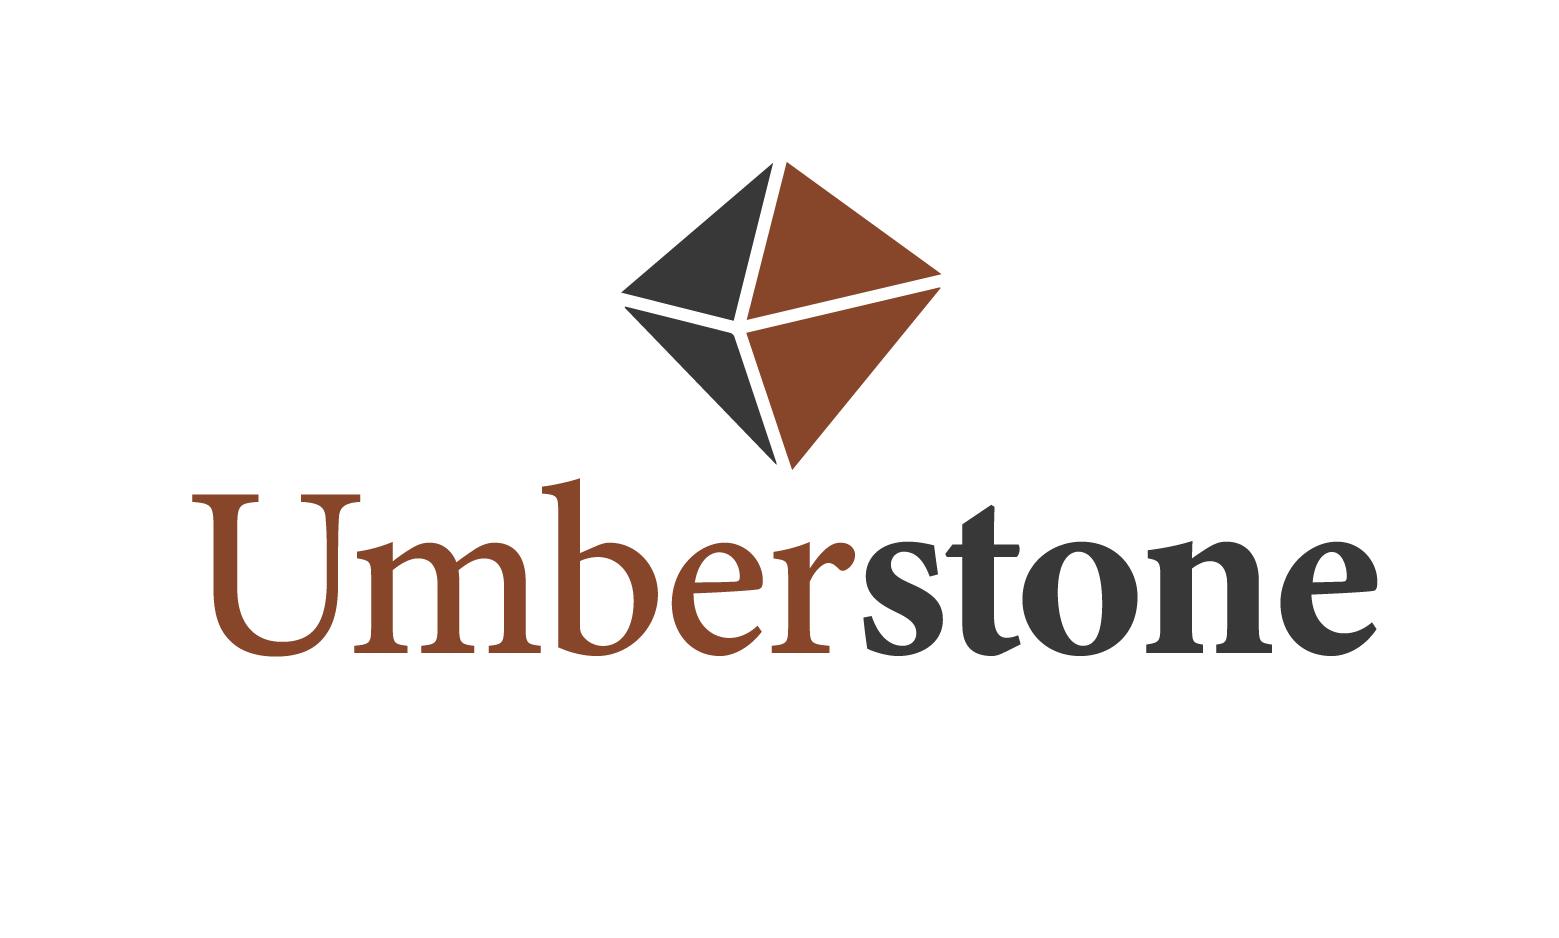 Umberstone.com